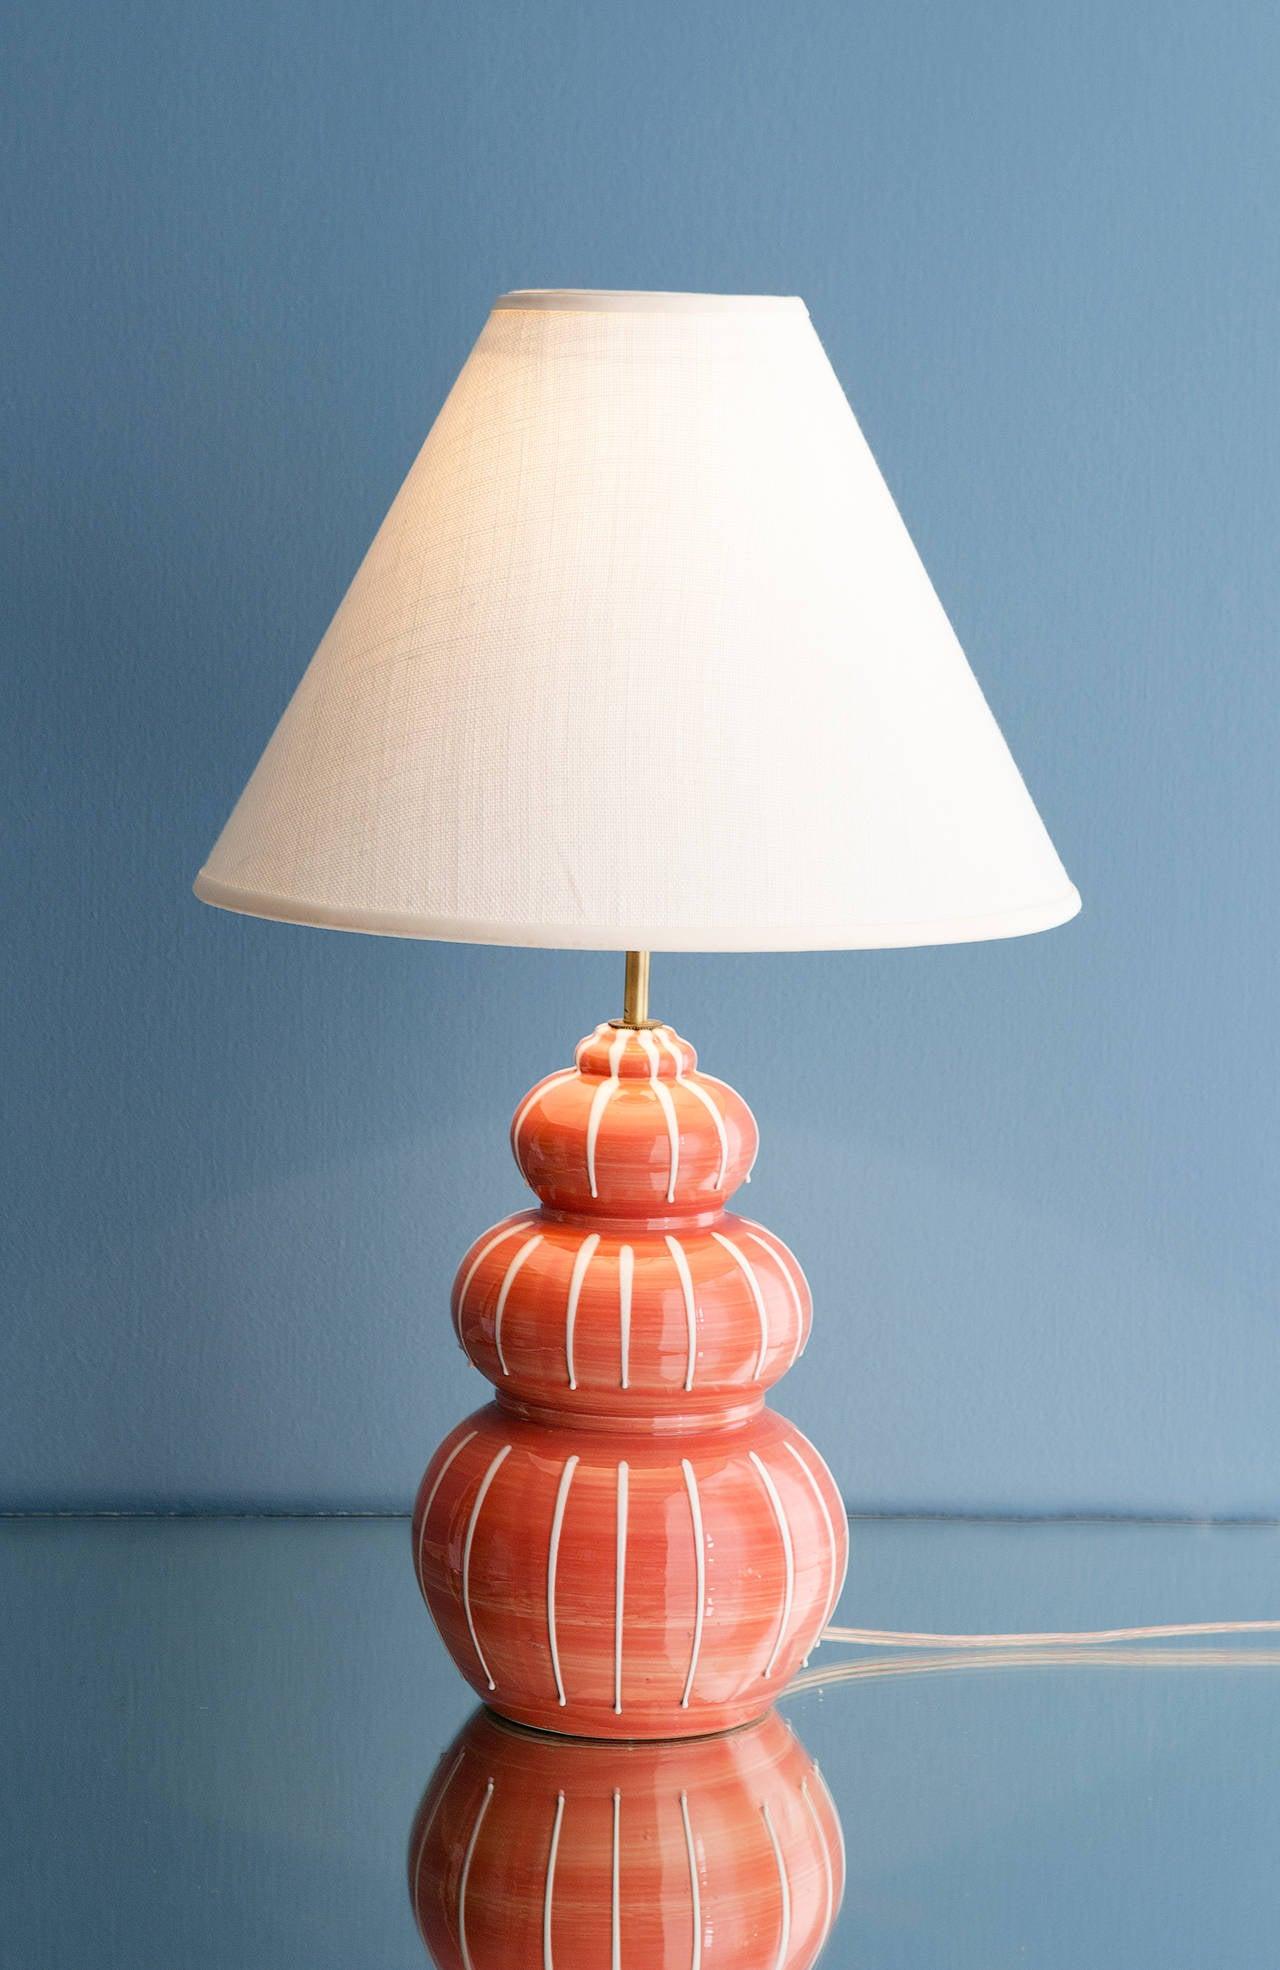 Vintage Ceramic Lamp 27